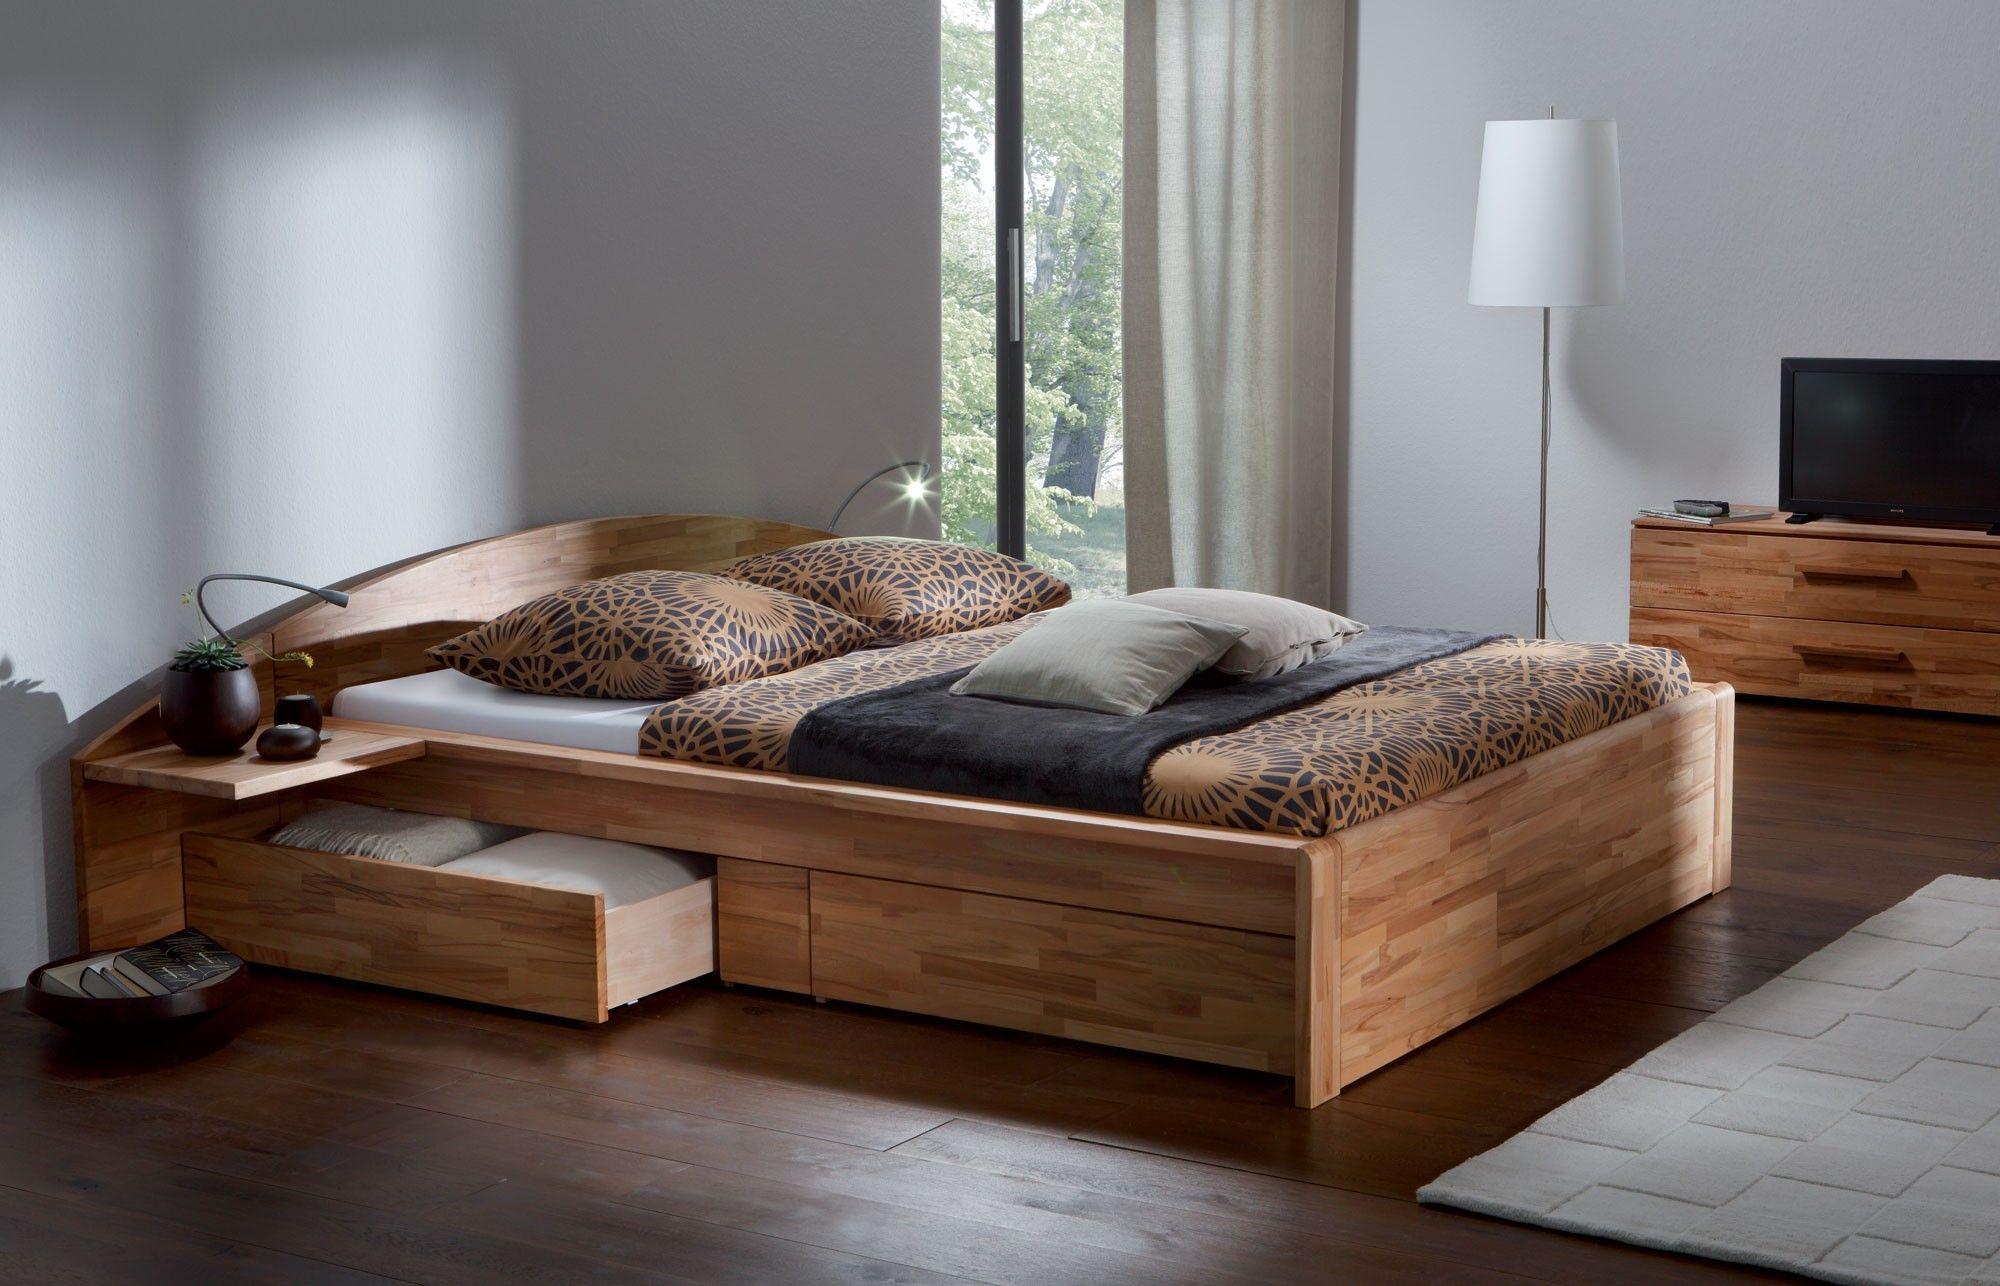 Hasena Woodline Berga Storage / Platform Bed with